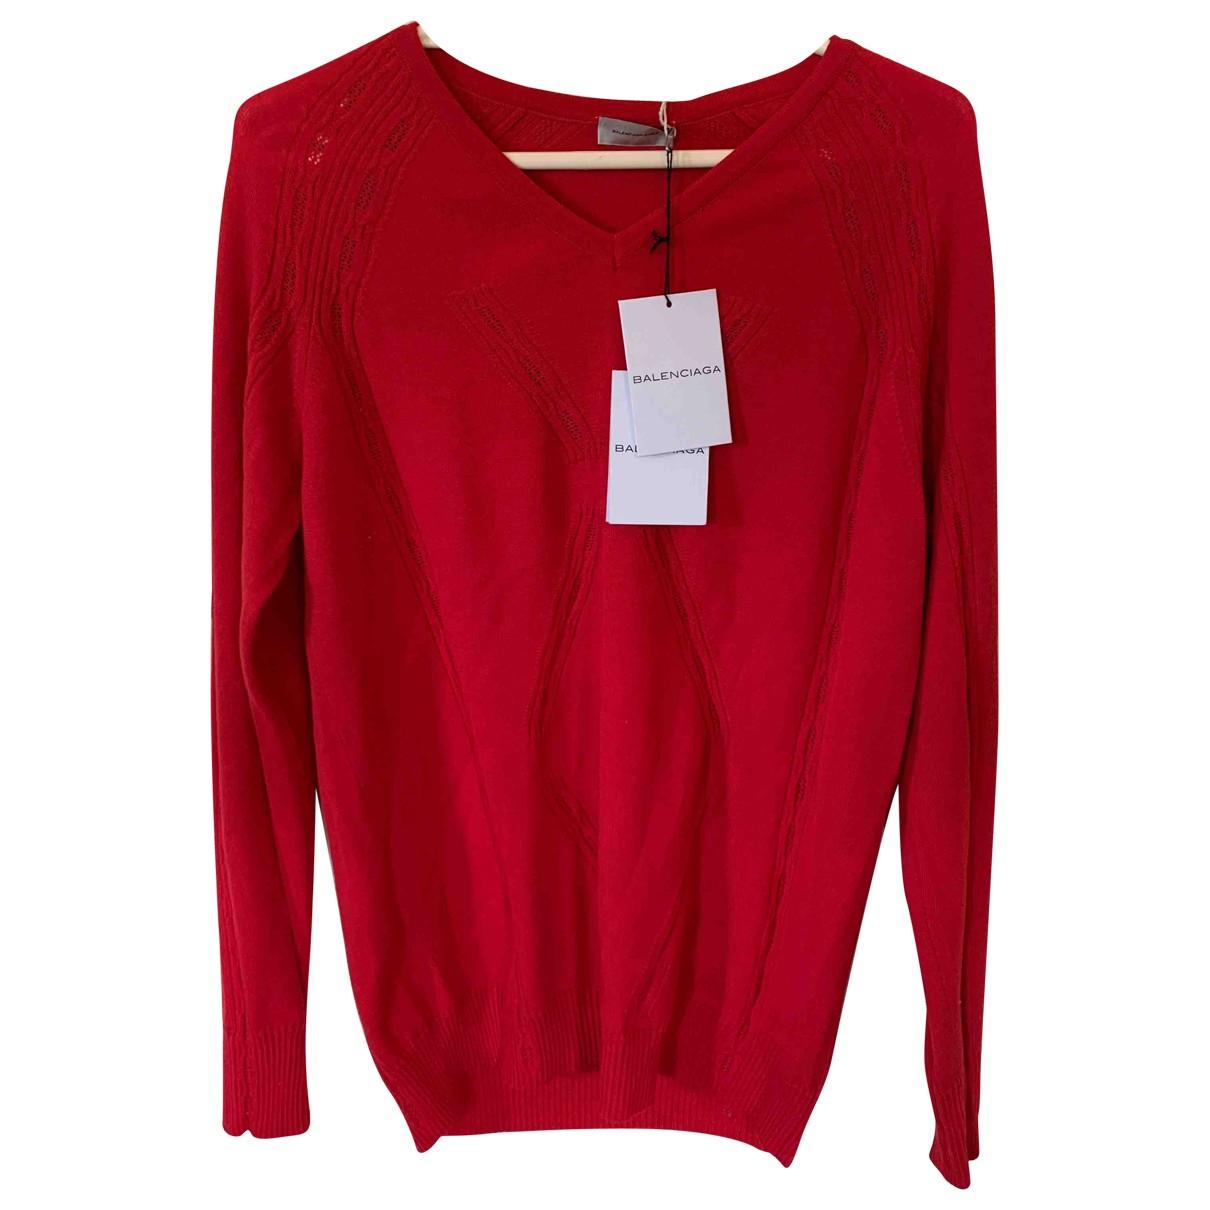 Balenciaga N Red Wool Knitwear & Sweatshirts for Men M International